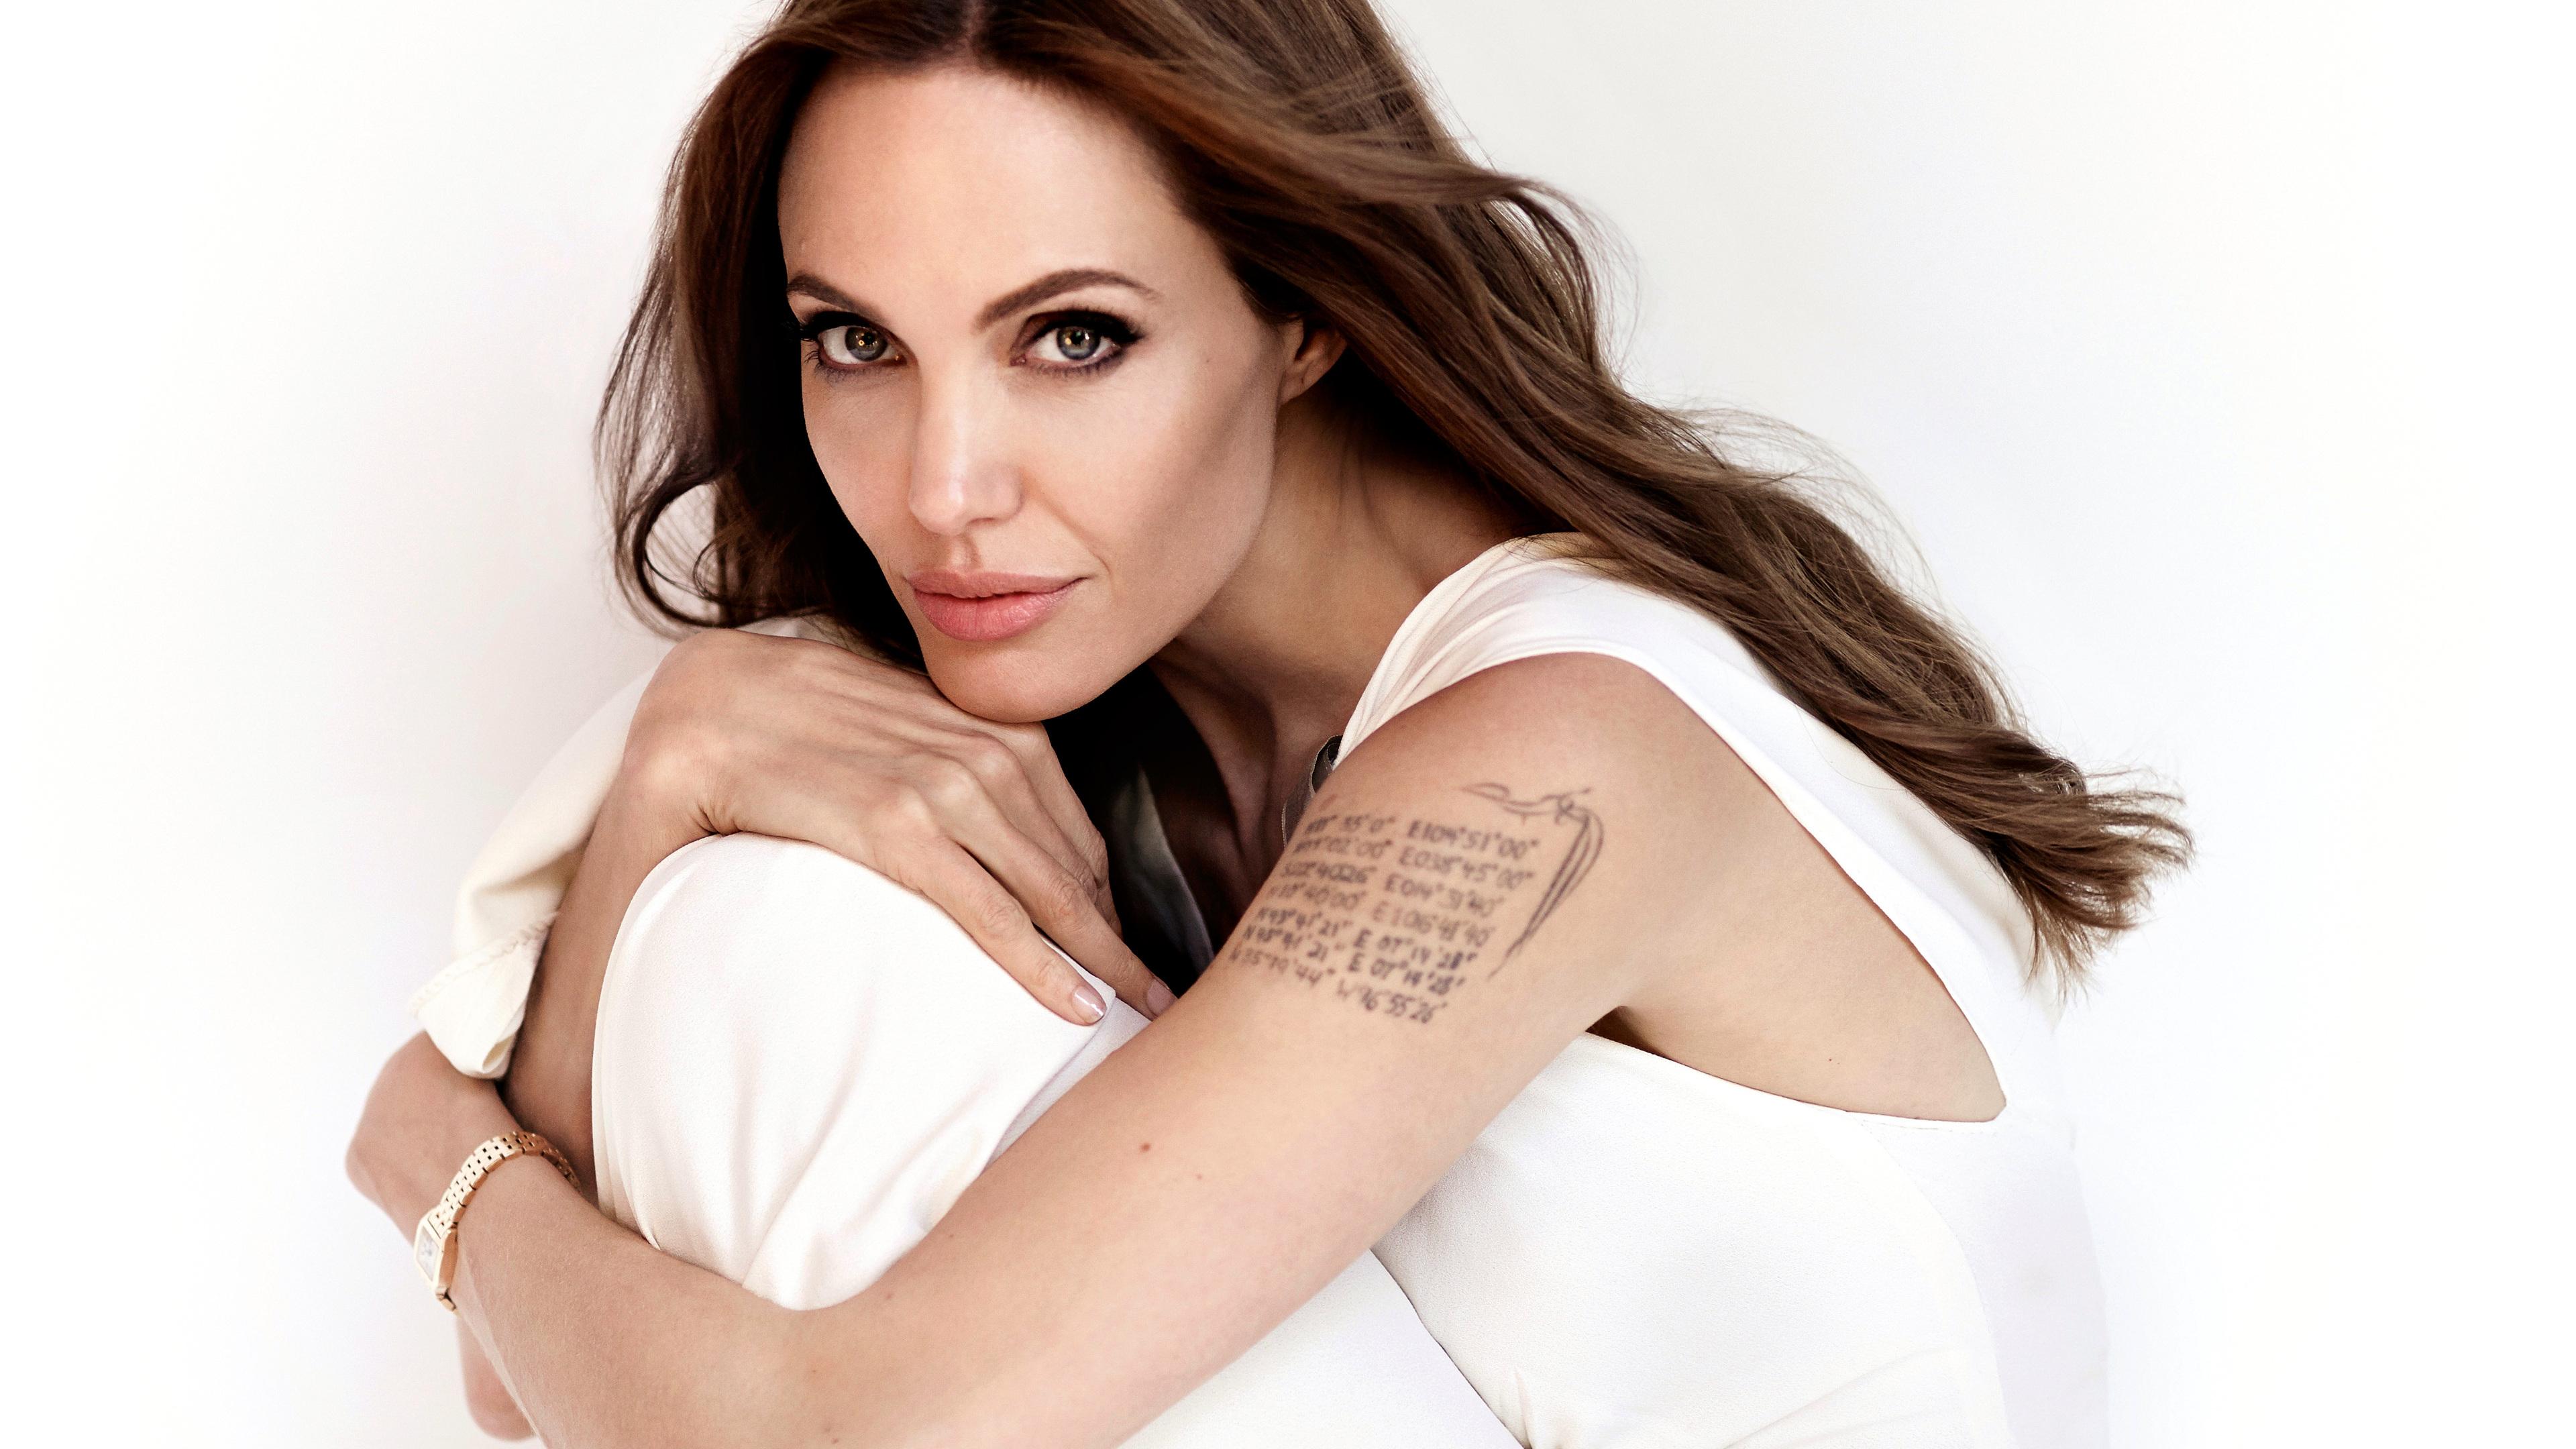 angelina jolie 2019 4k 1547937691 - Angelina Jolie 2019 4k - hd-wallpapers, girls wallpapers, celebrities wallpapers, angelina jolie wallpapers, 5k wallpapers, 4k-wallpapers